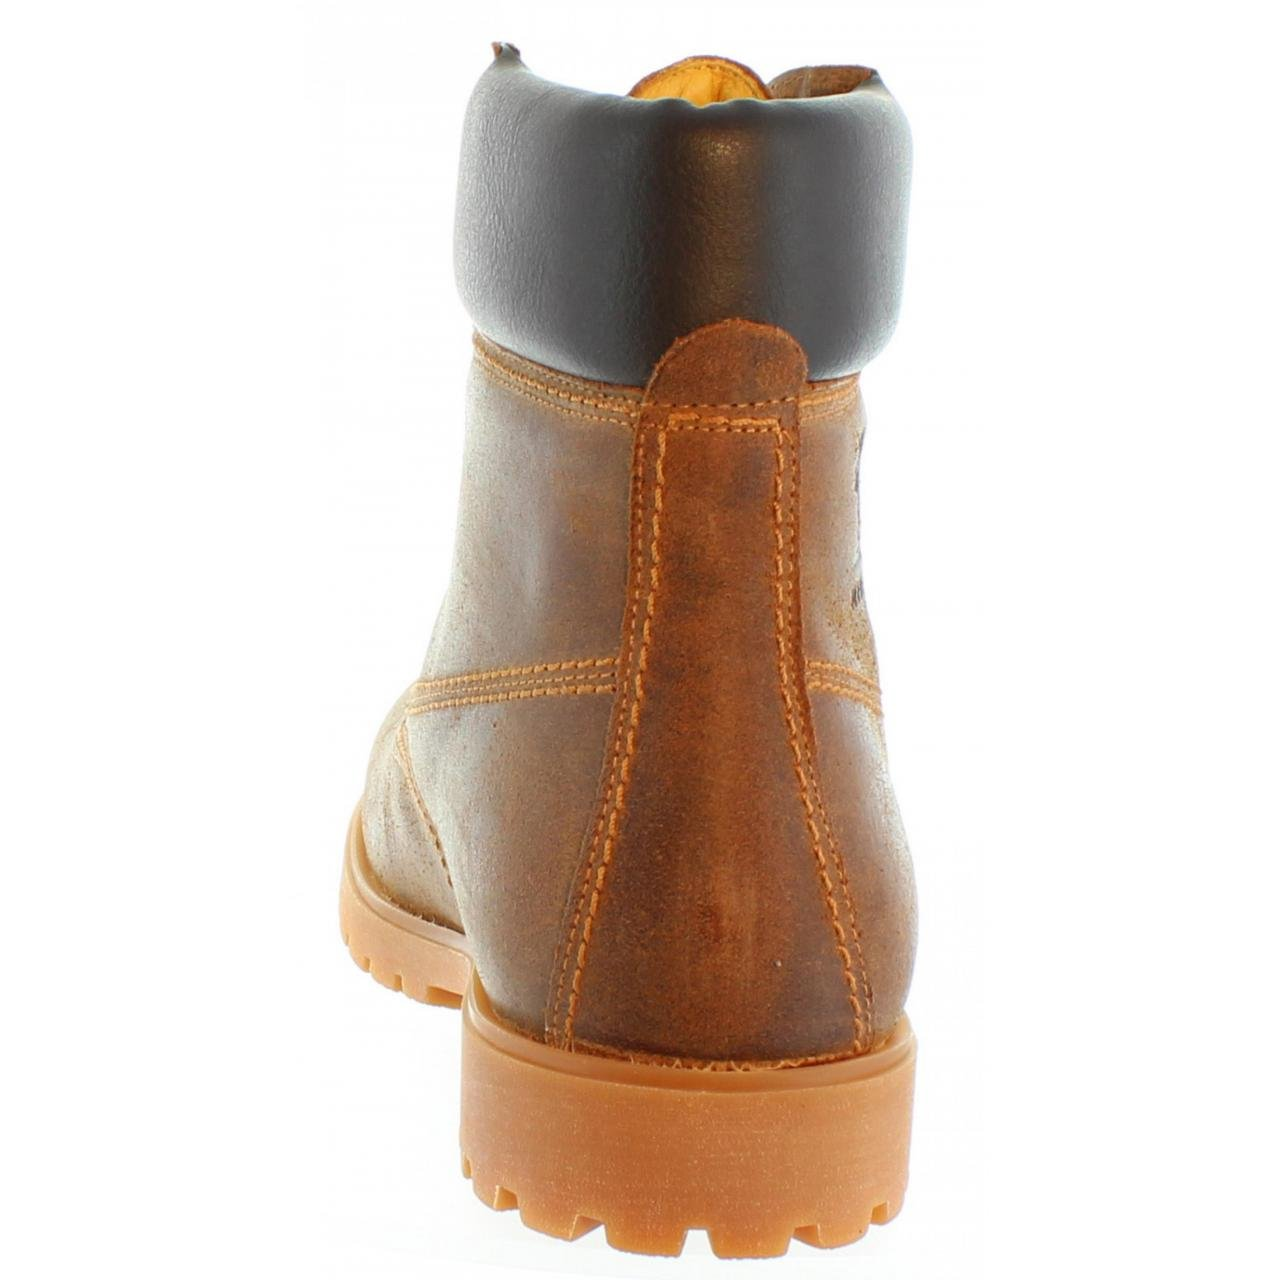 PANAMA JACK Stiefel Herren für Herren Stiefel Panama 03 C45 Velour Grass Cuero b5290e